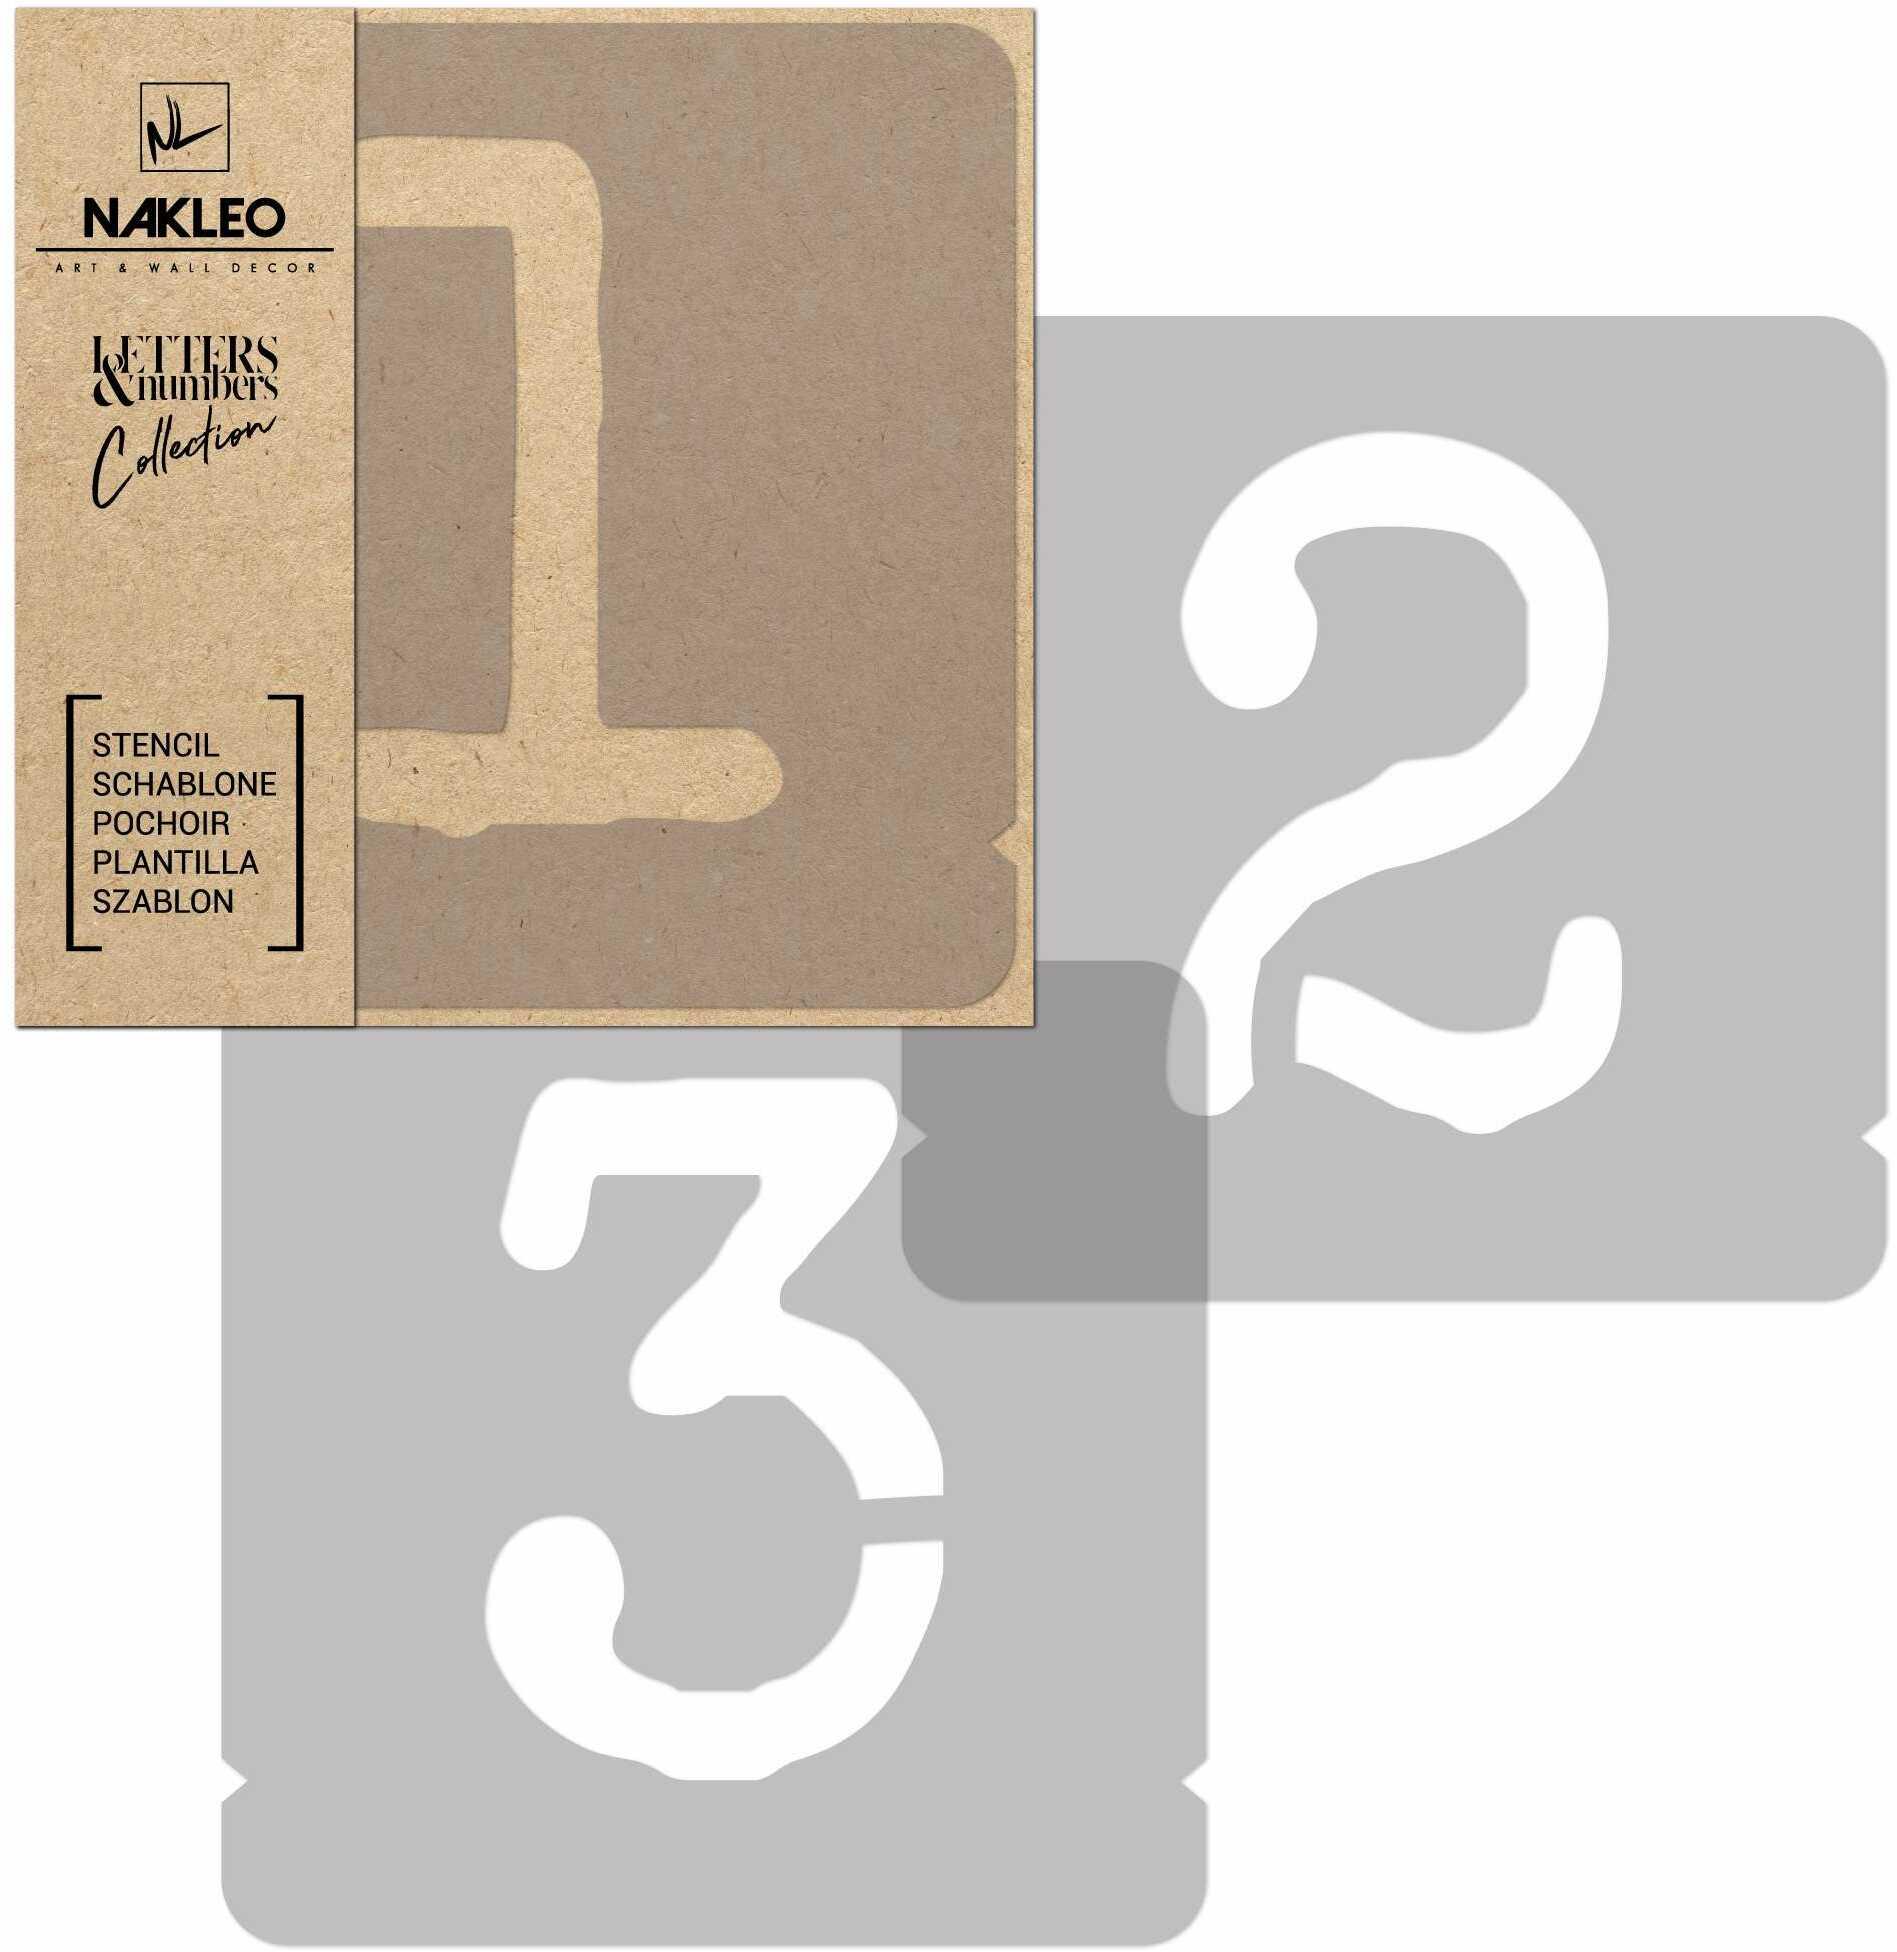 szablon malarski wielokrotny // cyfry 250 mm // Typewriter Cyfry